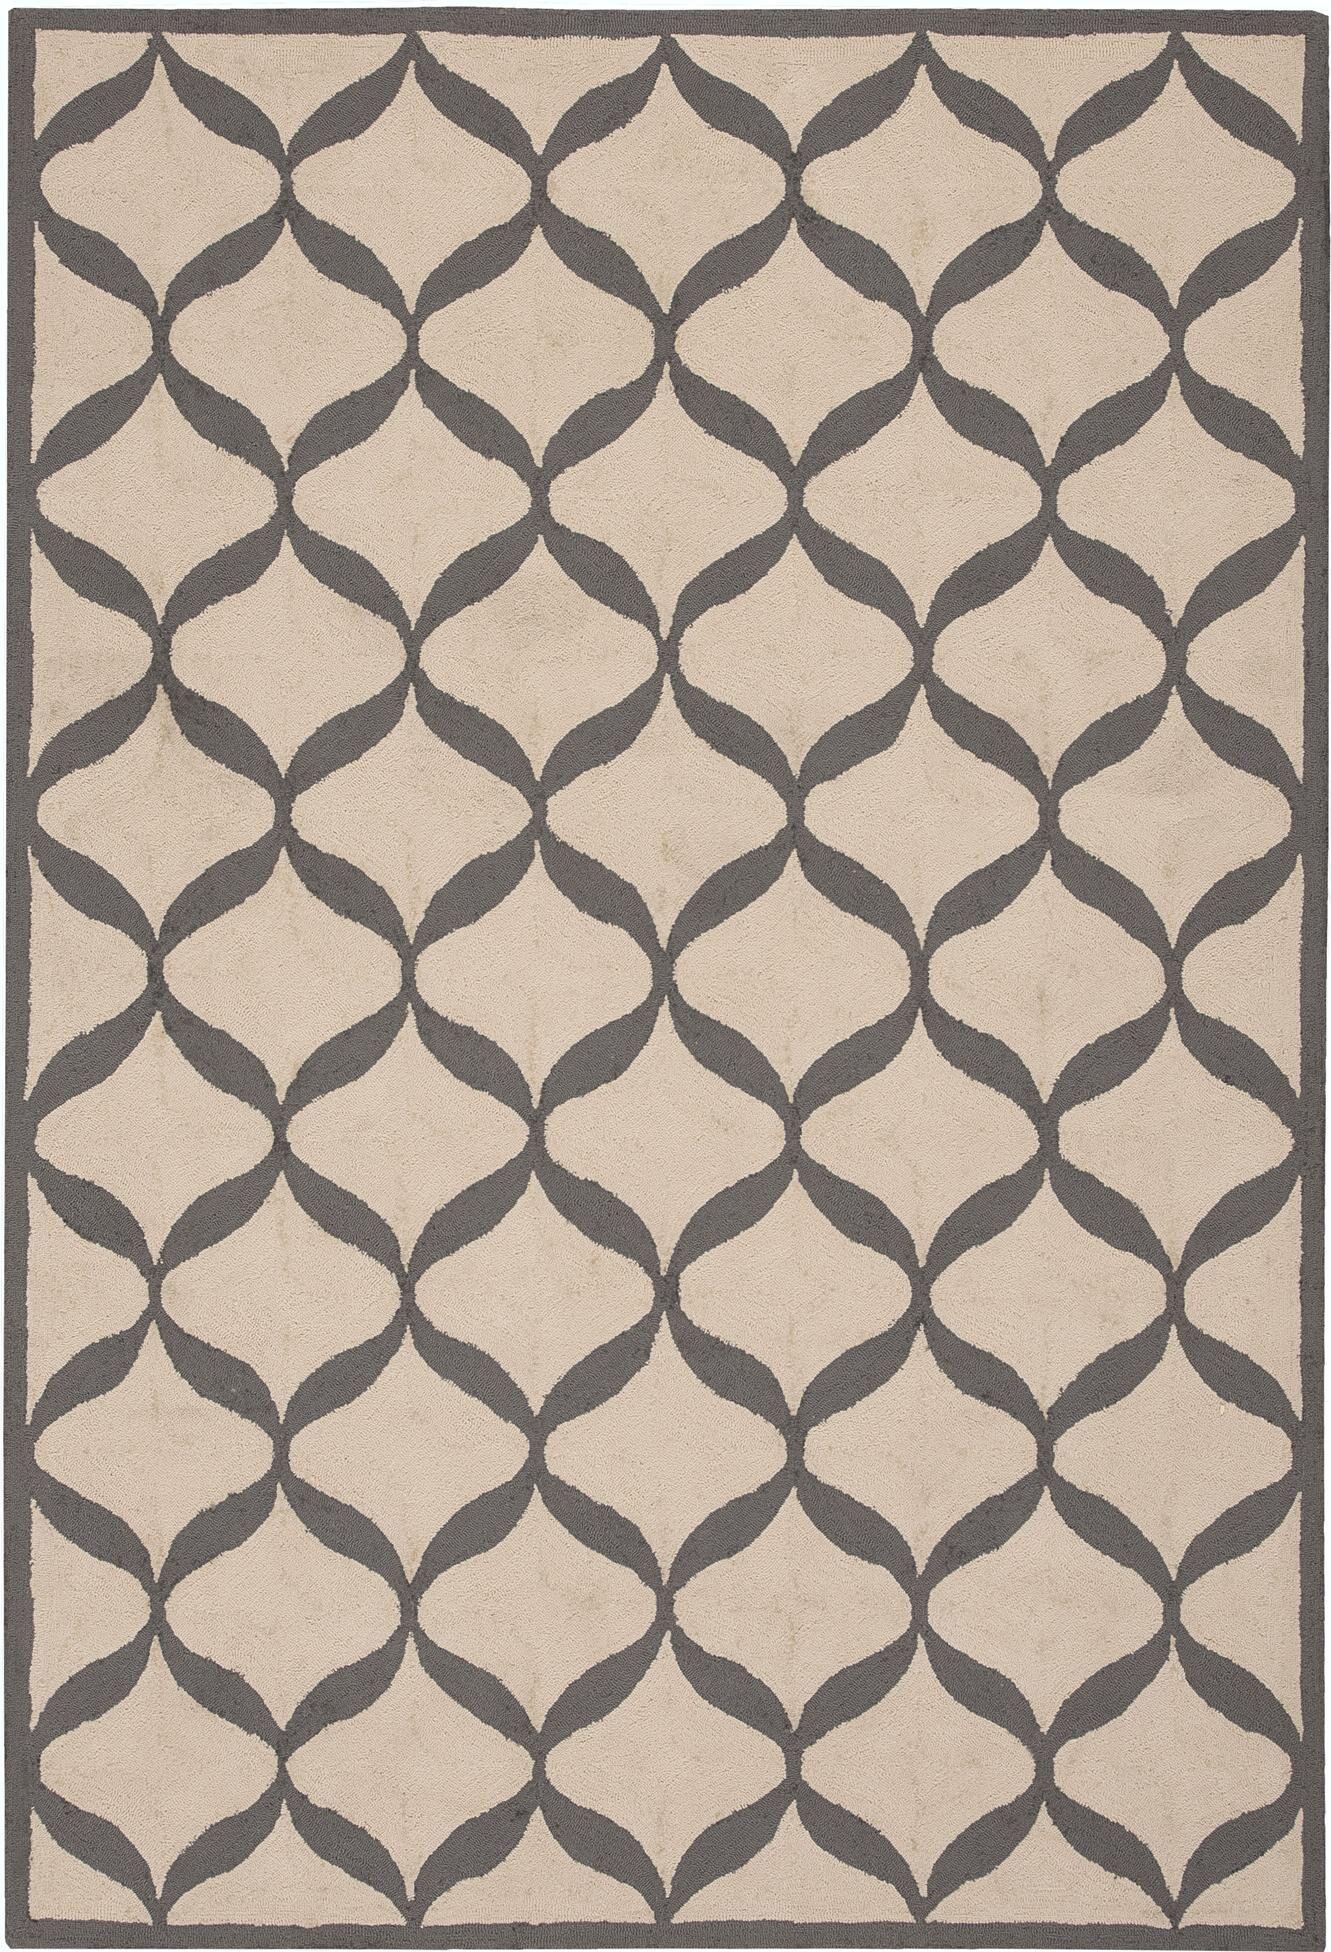 LaGuardia Hand-Tufted White/Light Gray Area Rug Rug Size: Rectangle 5' x 7'